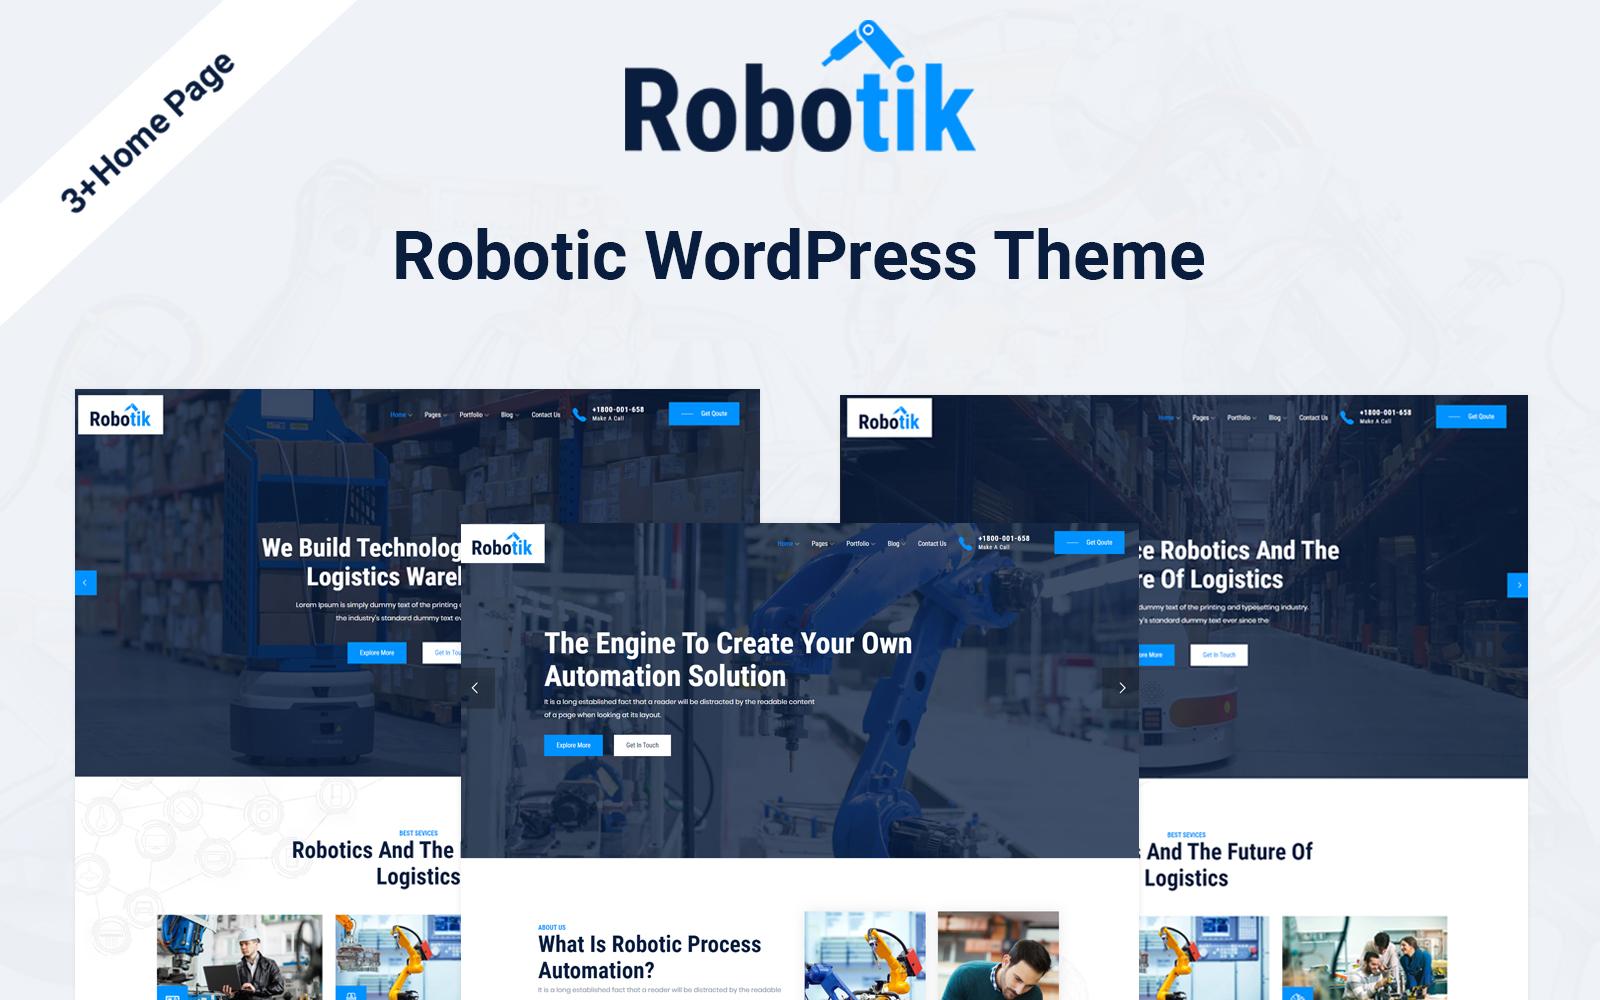 """Robotik - Robotic Automation"" thème WordPress Bootstrap #125685"